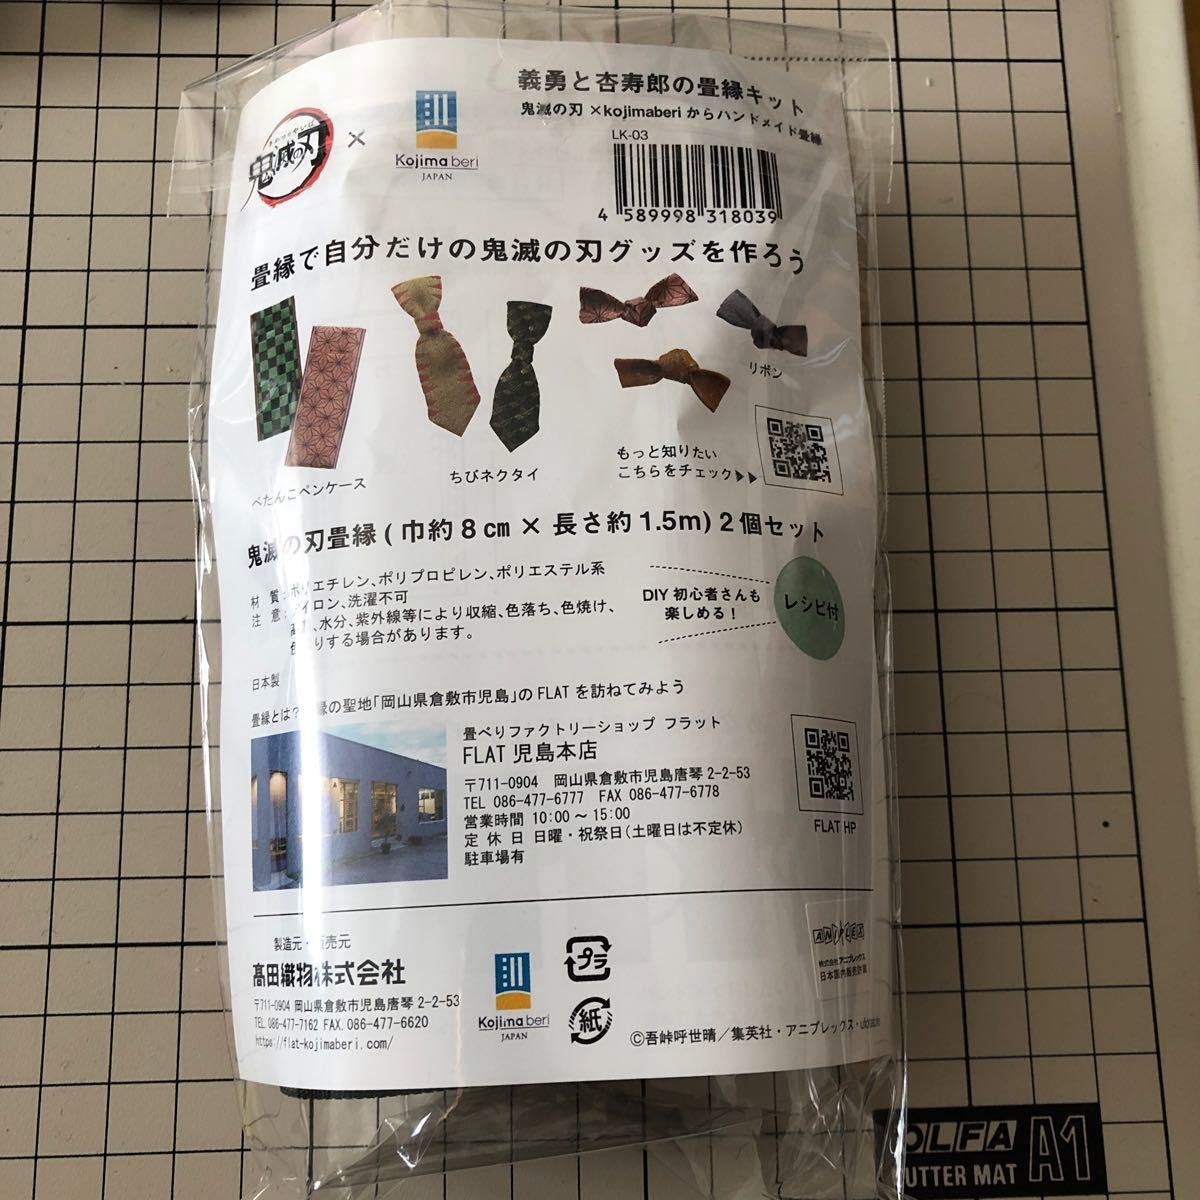 鬼滅の刃 畳縁セット 冨岡義勇 煉獄杏寿郎